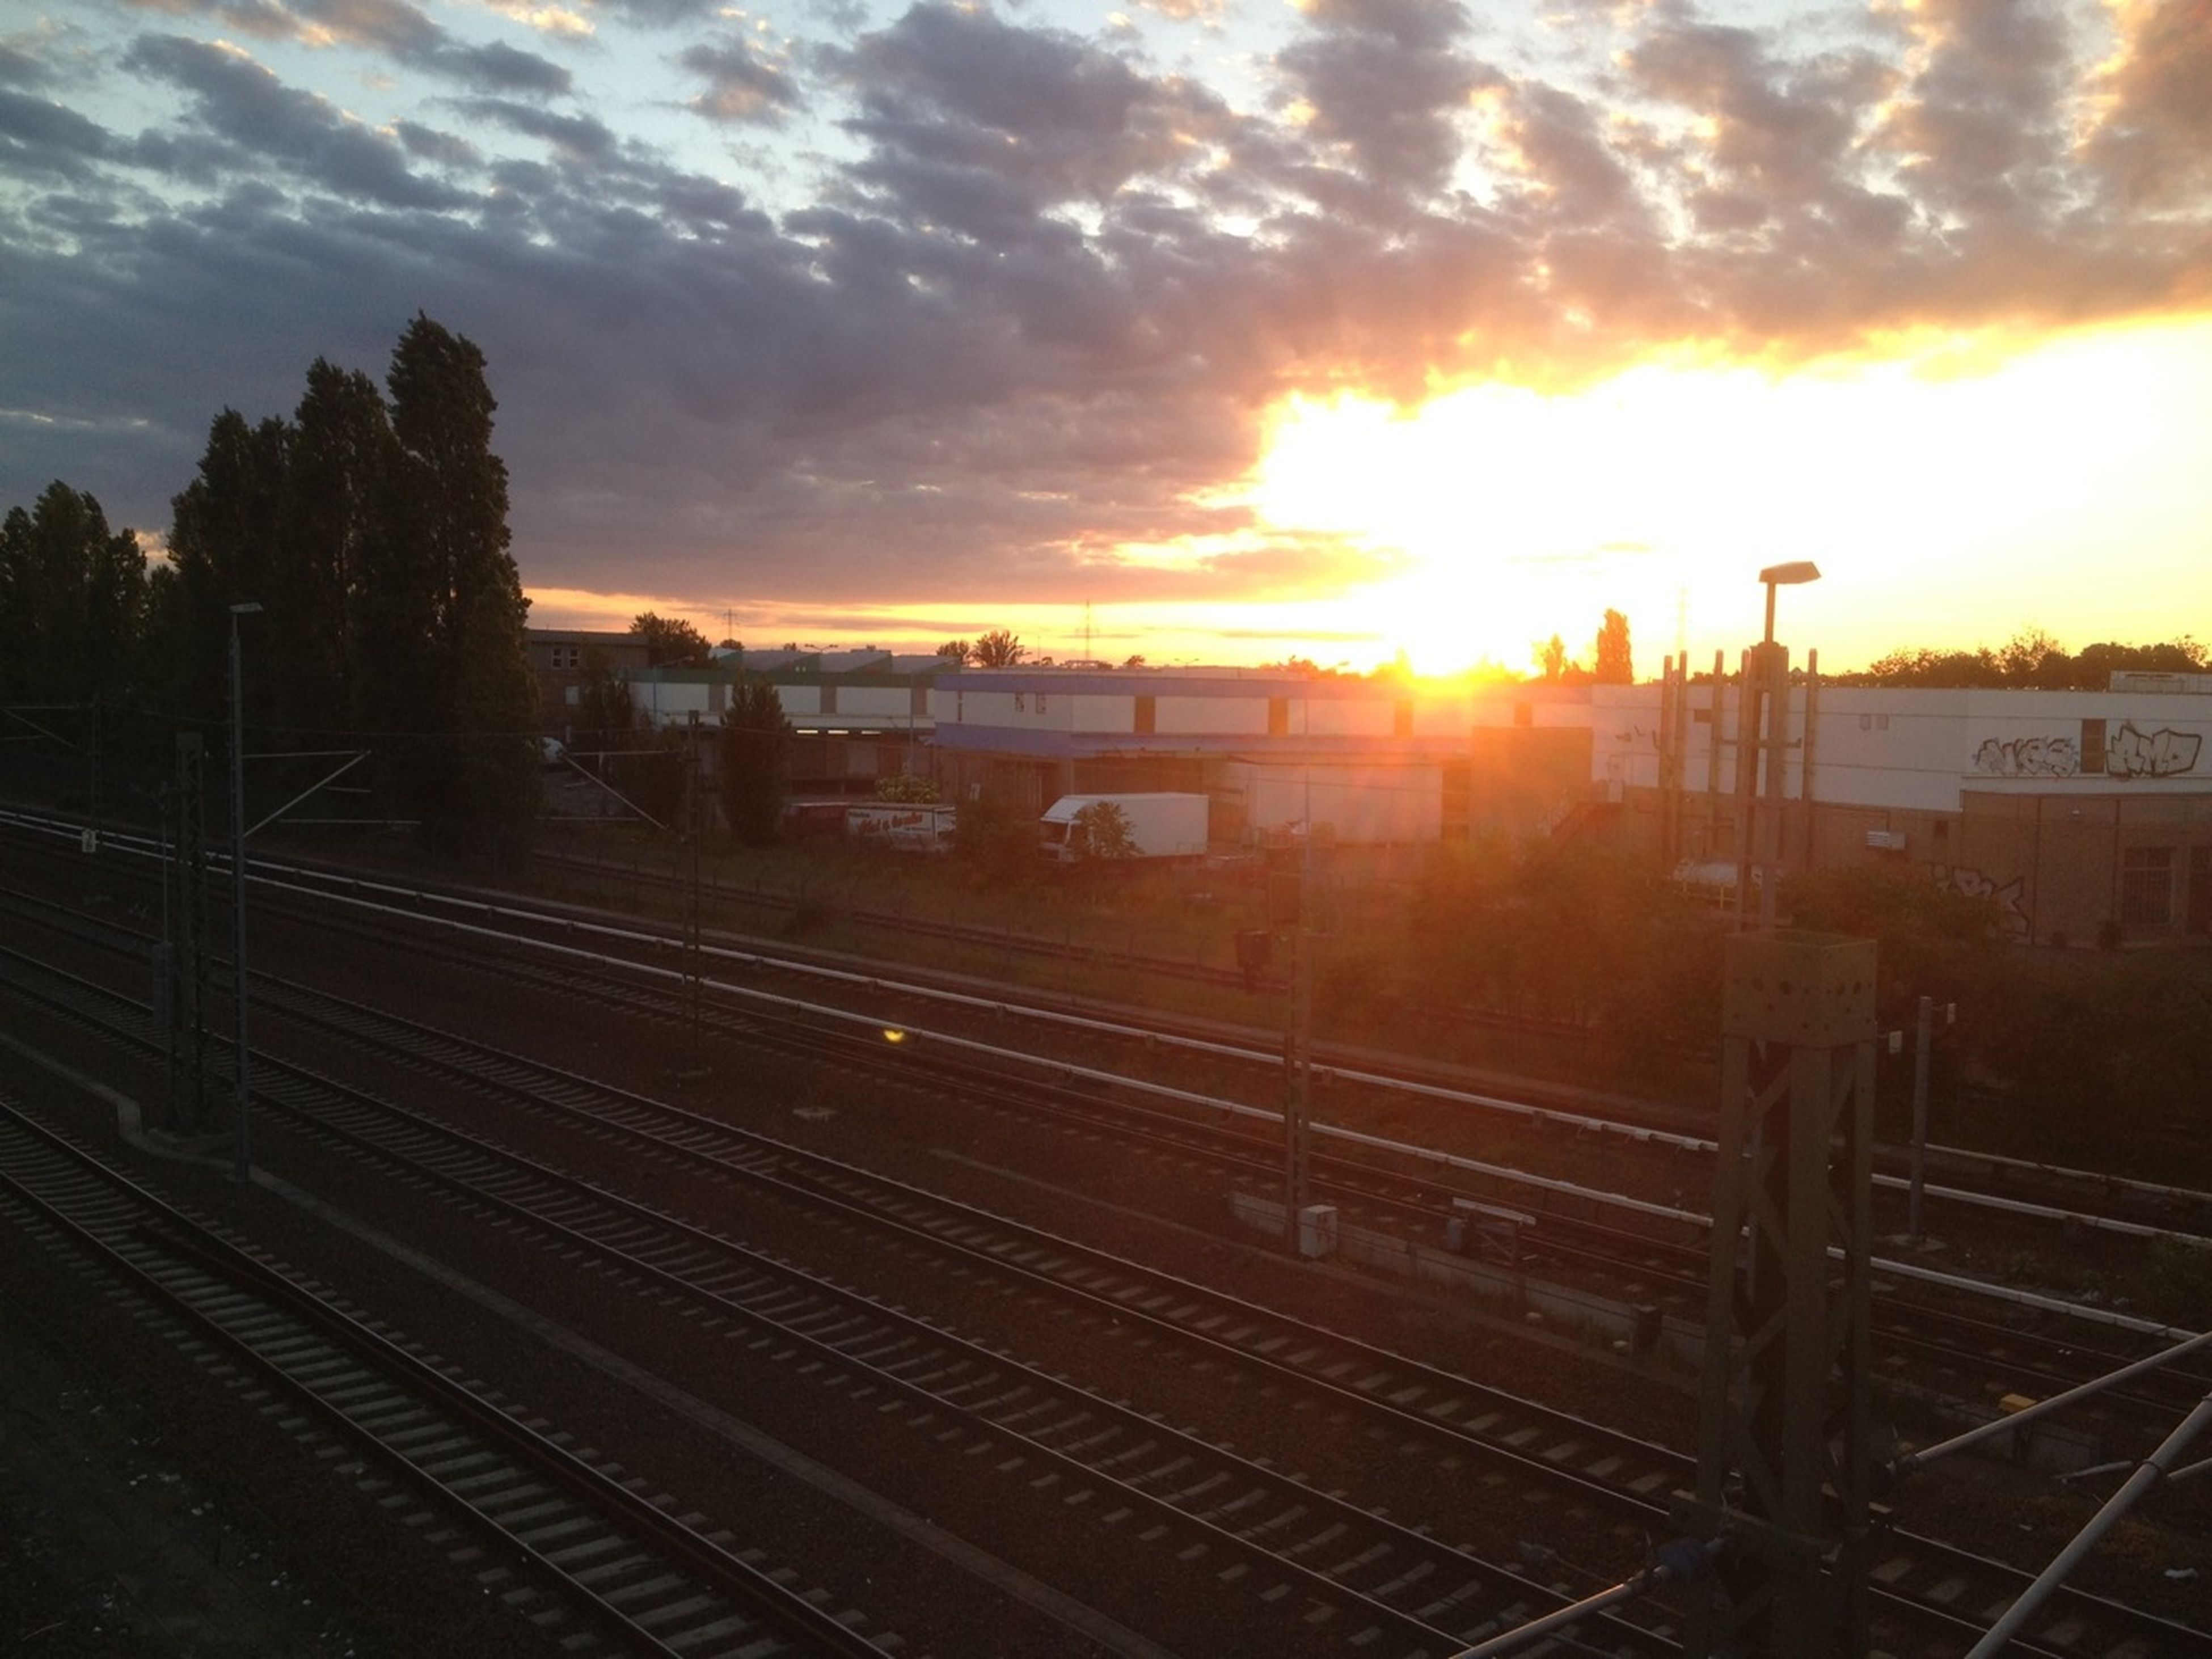 sunset, sky, cloud - sky, railroad track, sun, orange color, sunlight, silhouette, landscape, rail transportation, built structure, nature, sunbeam, cloud, scenics, beauty in nature, tranquil scene, tranquility, architecture, building exterior